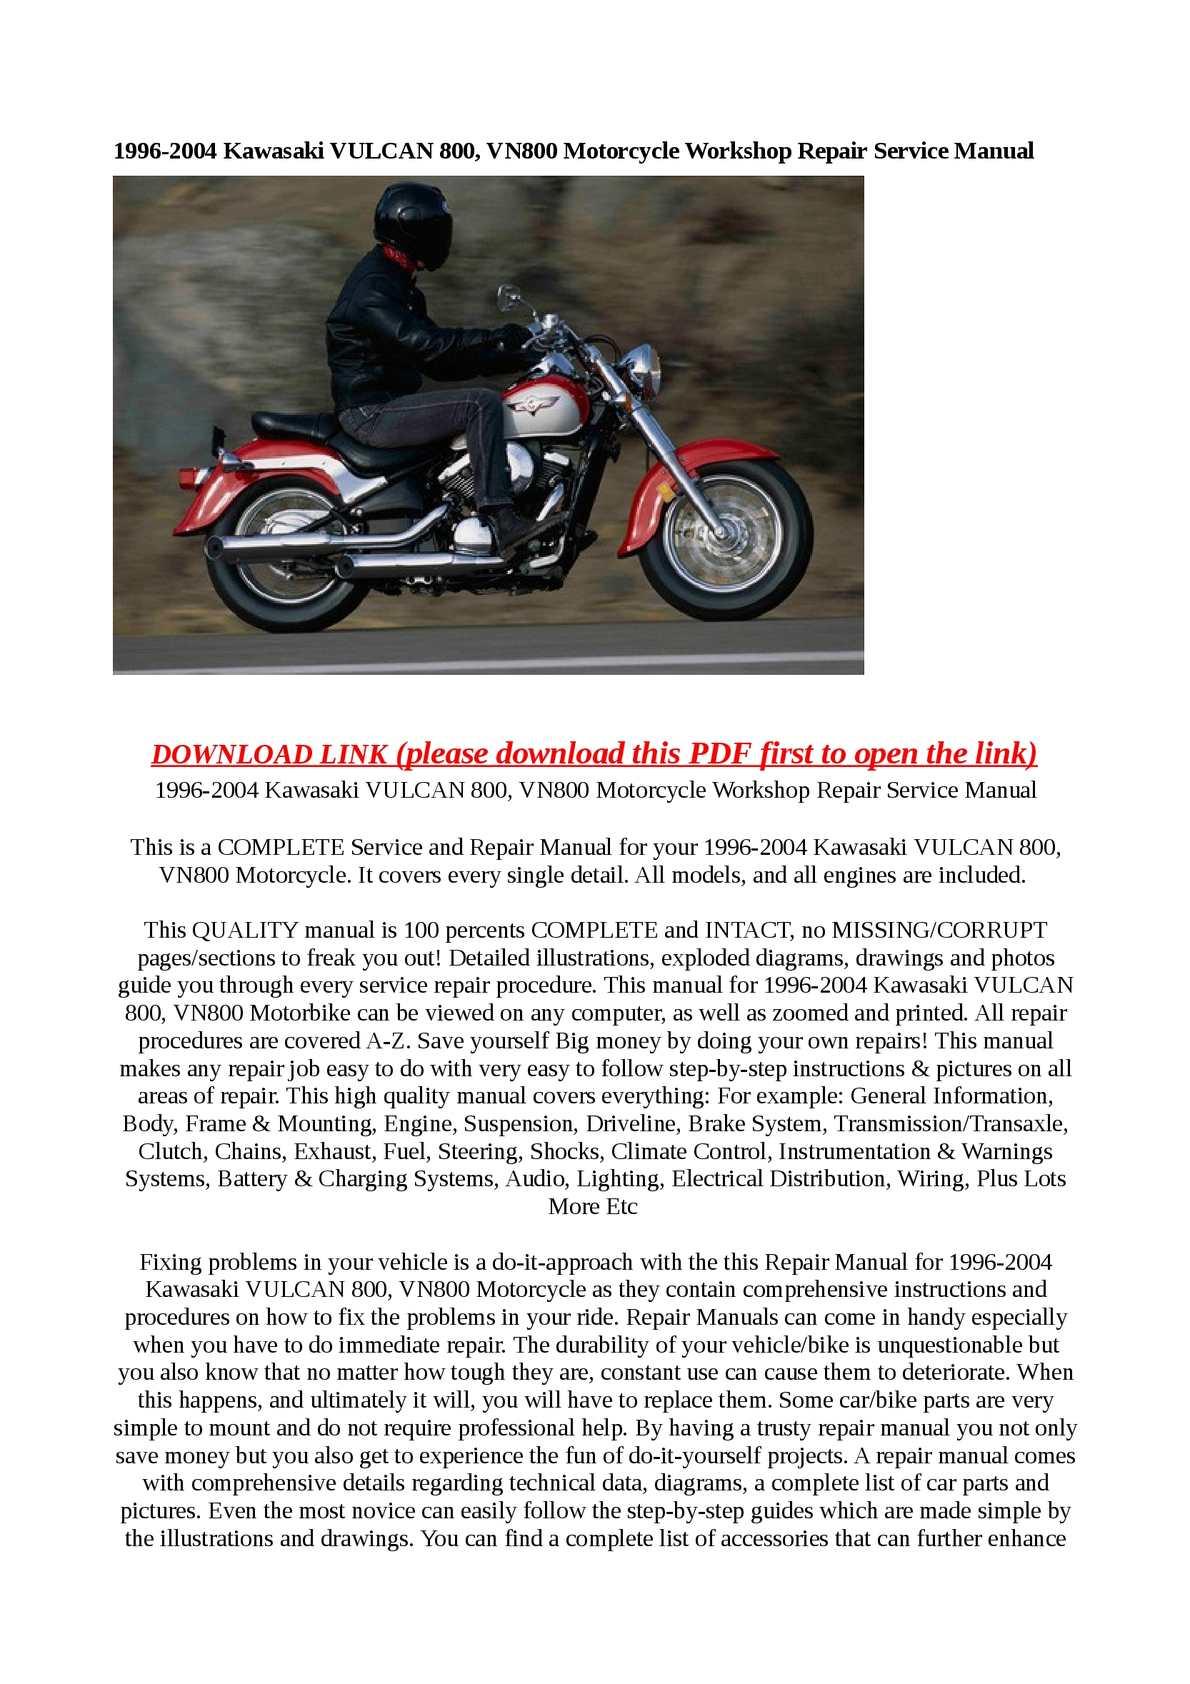 Calaméo - 1996-2004 Kawasaki VULCAN 800, VN800 Motorcycle Workshop Repair  Service Manual